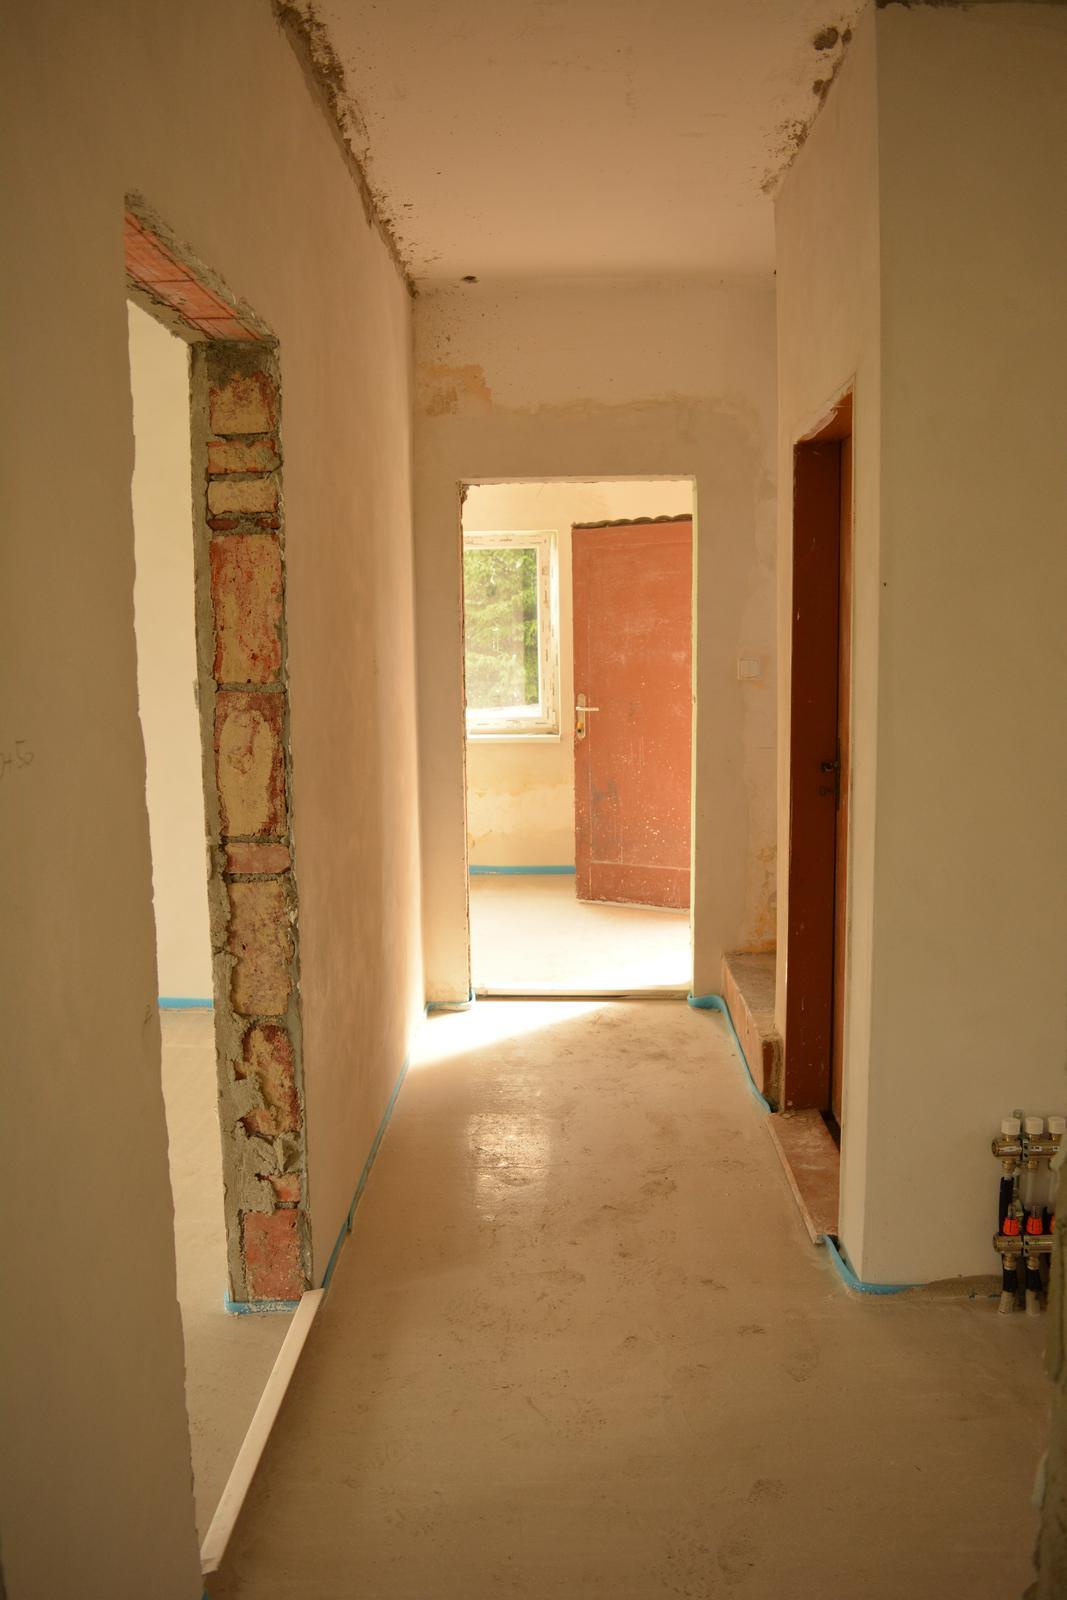 Náš nový domov ... - Obrázek č. 81